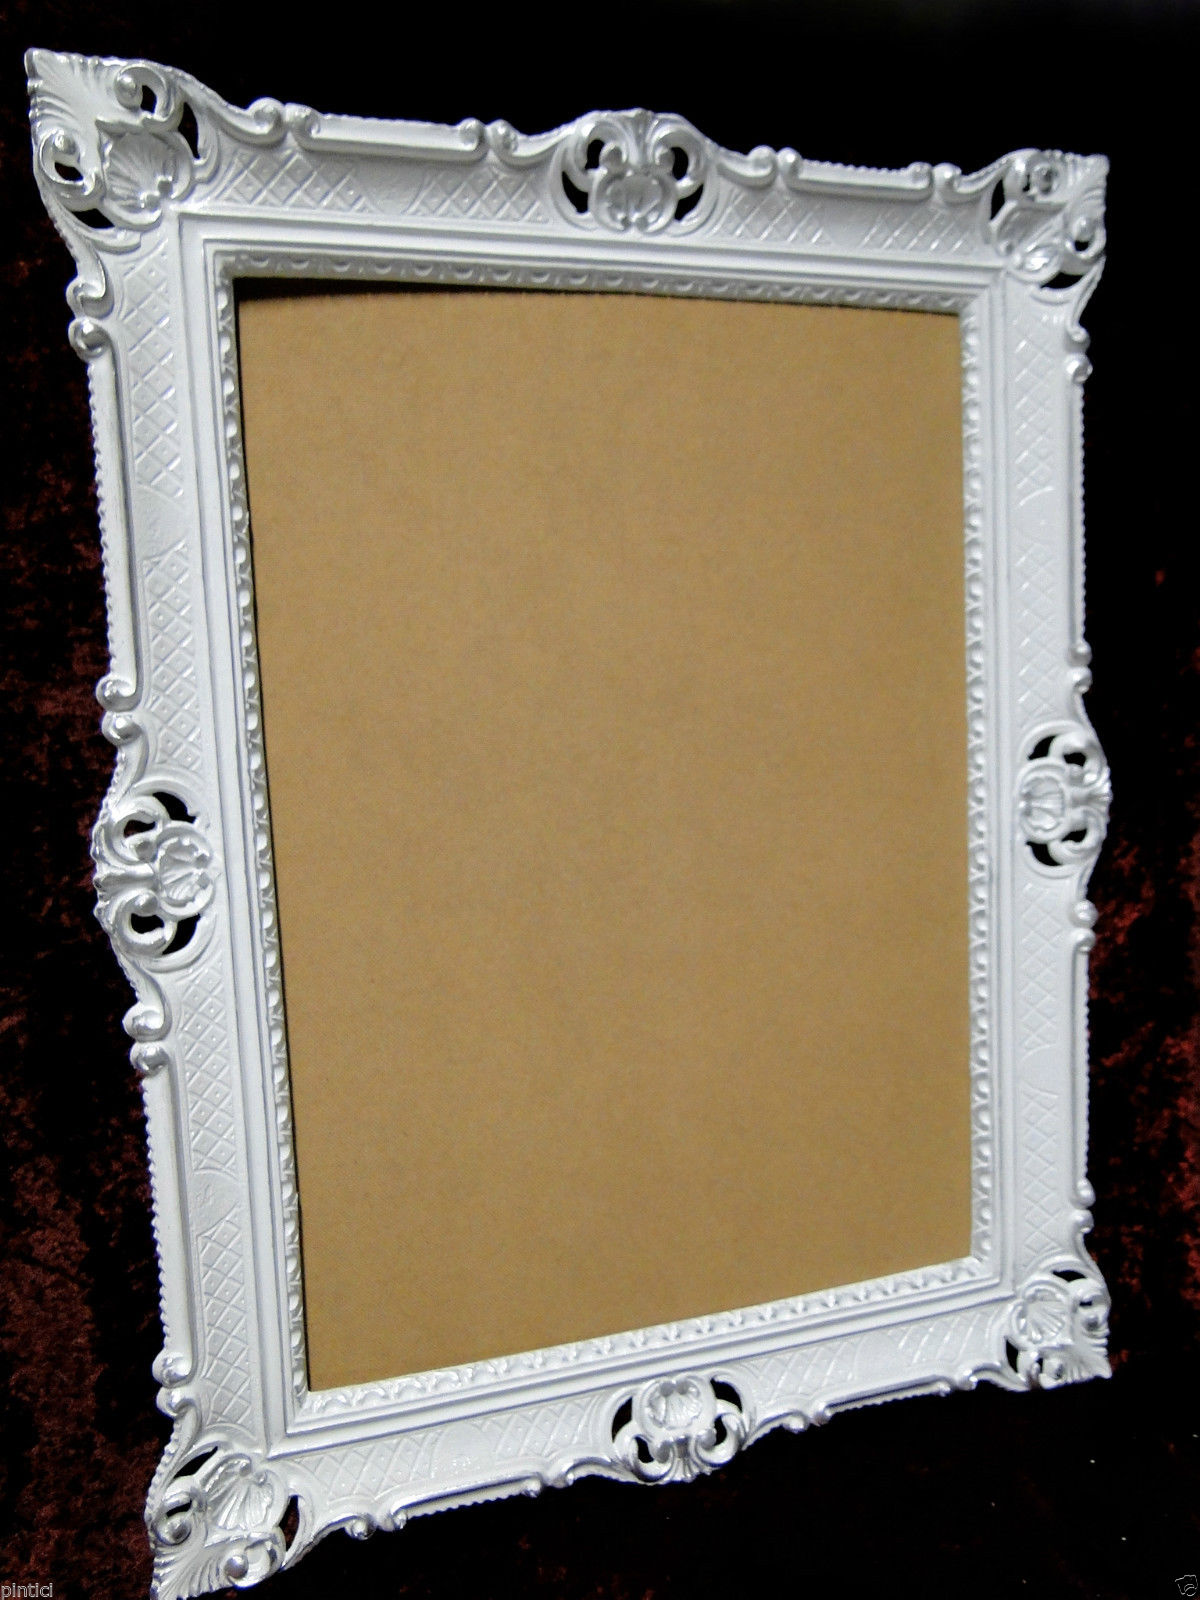 bilderrahmen barock wei silber hochzeitsrahmen antik 90x70 fotorahmen gro 3057 kaufen bei. Black Bedroom Furniture Sets. Home Design Ideas